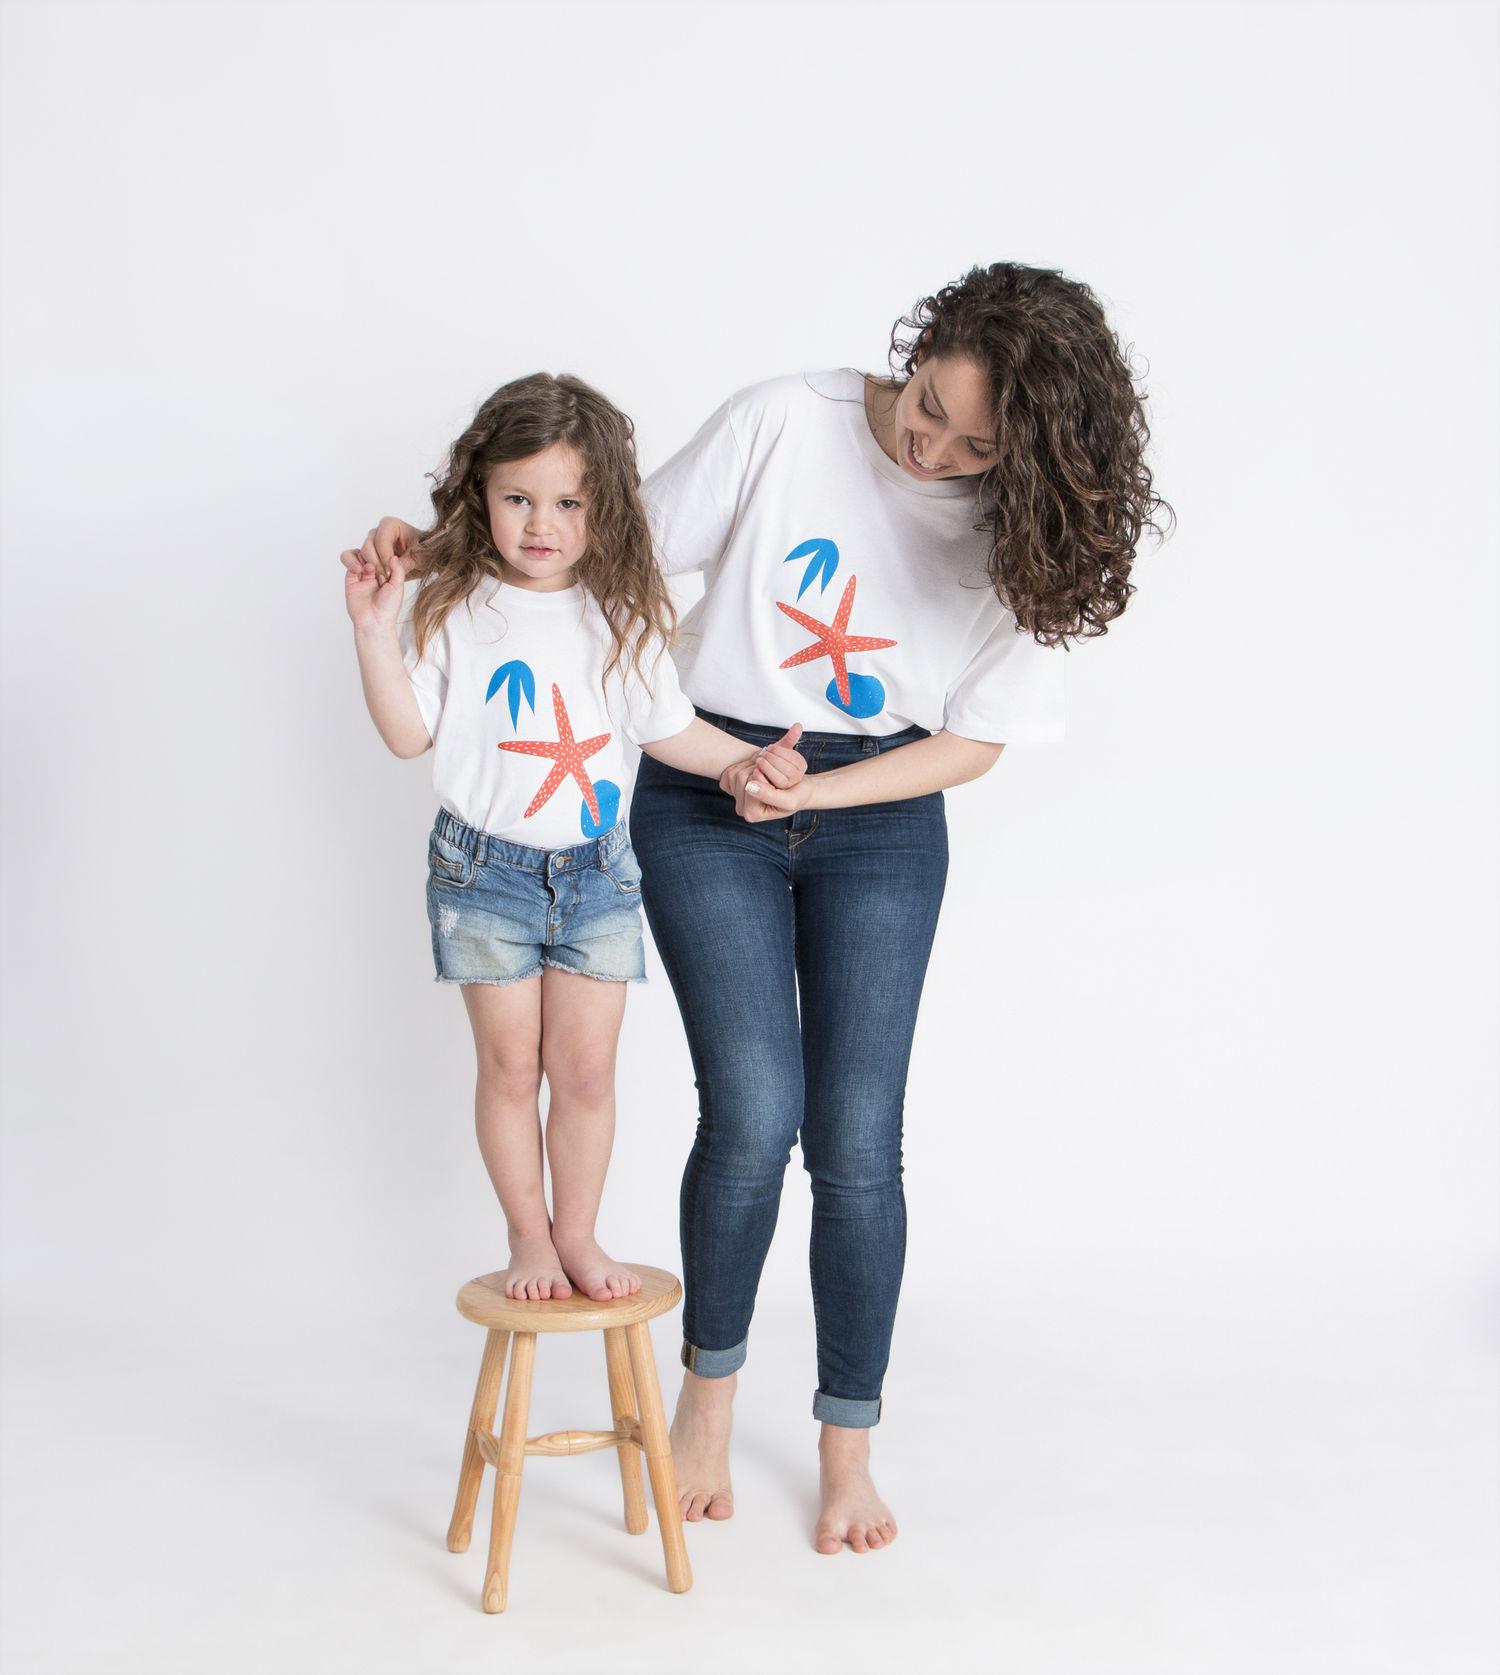 madre e hija iguales_camiseta estrella.jpg